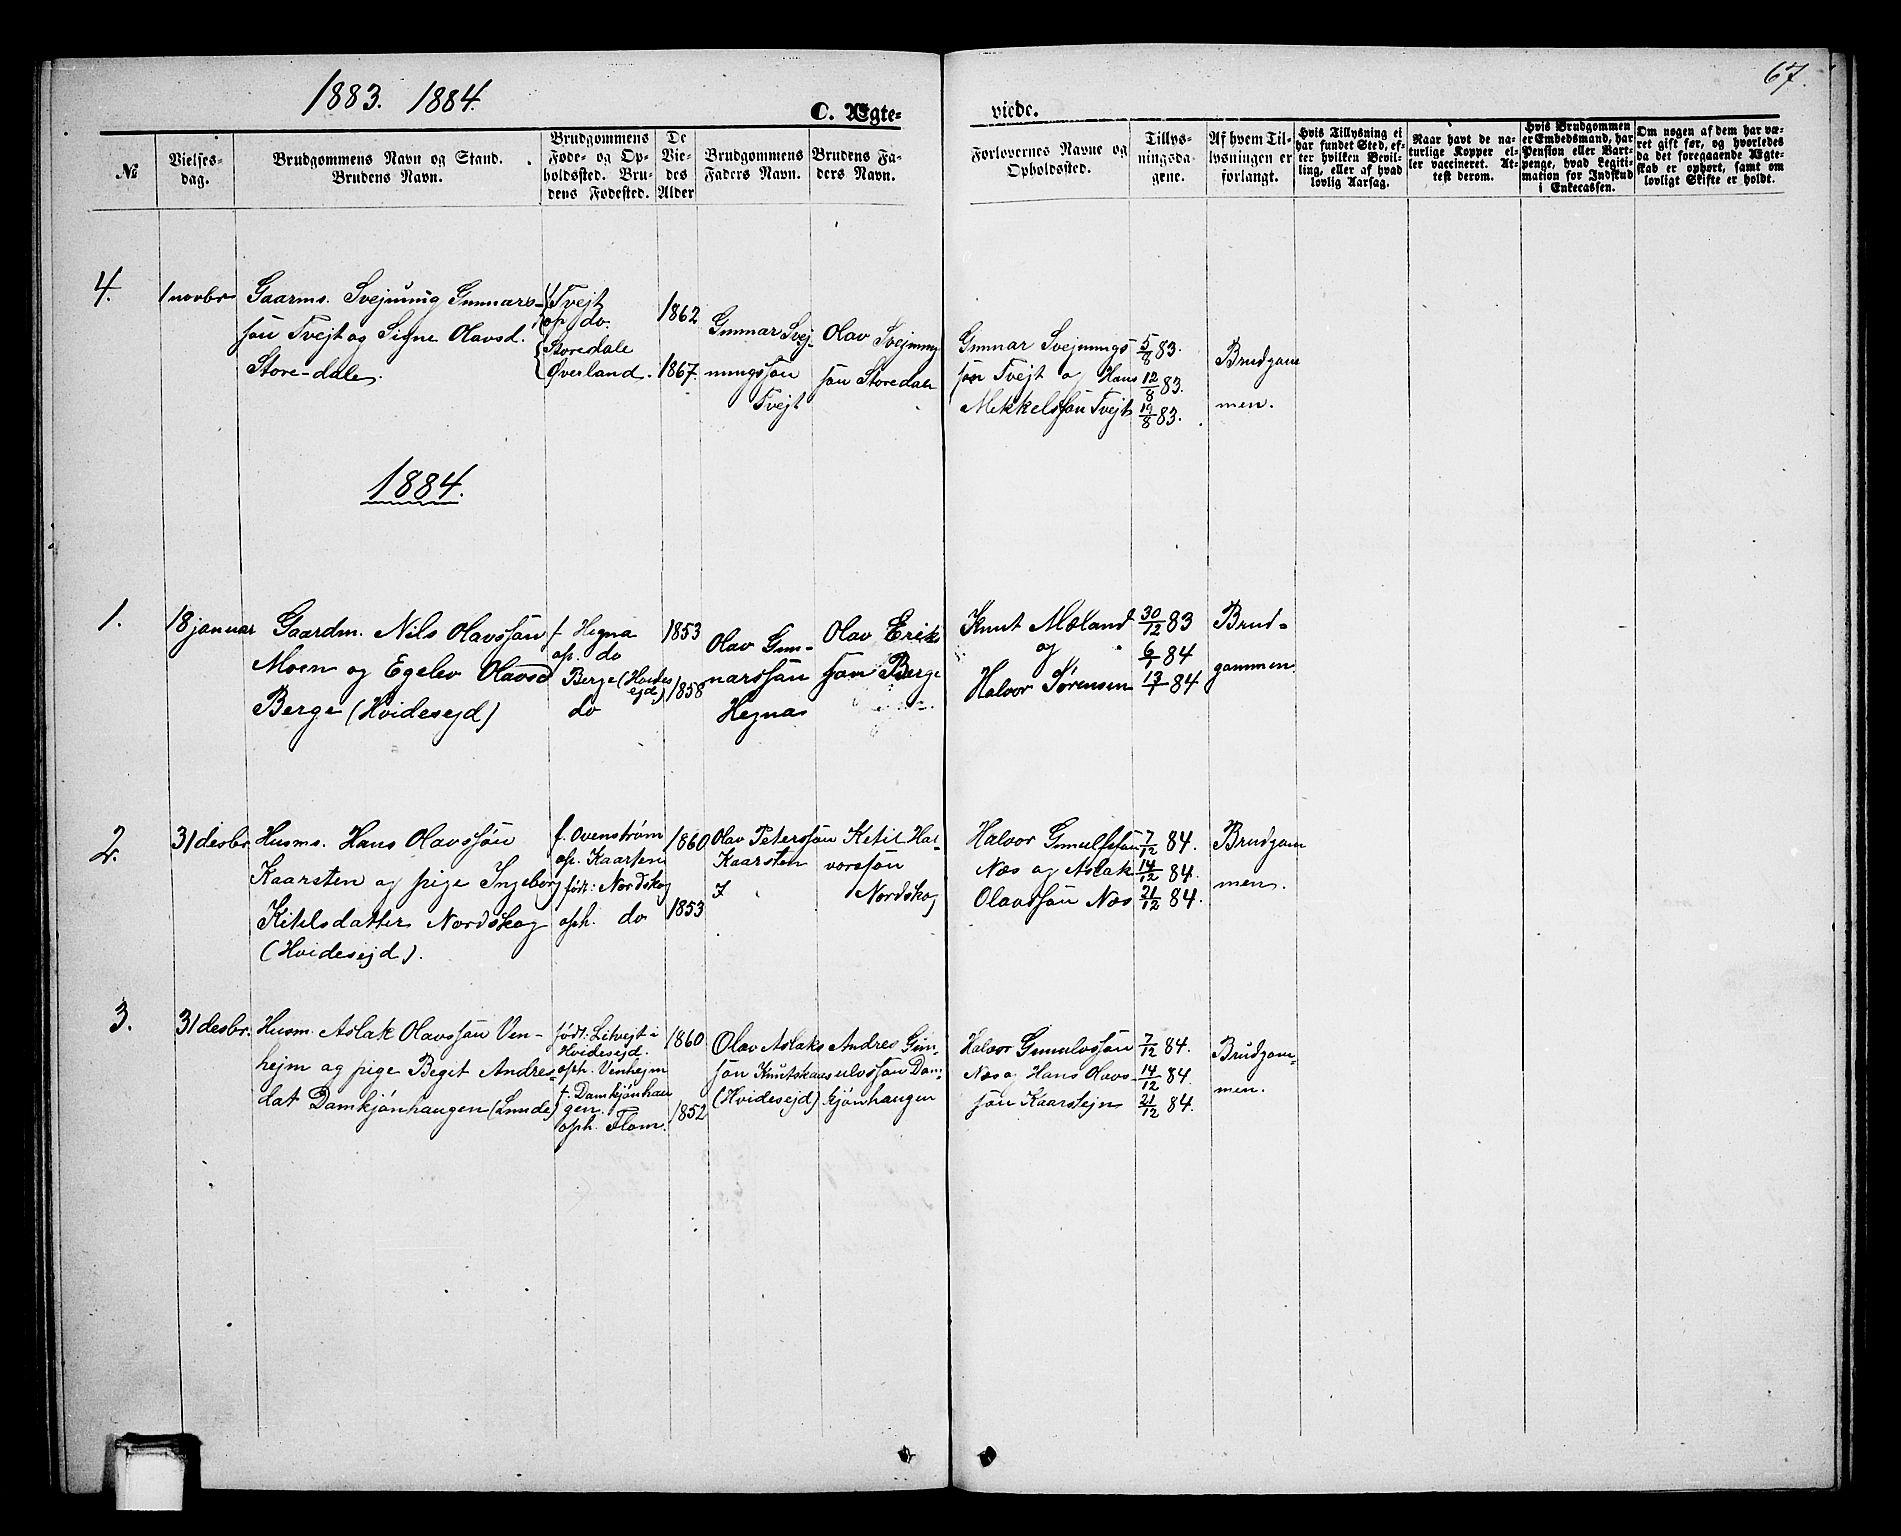 SAKO, Lunde kirkebøker, G/Gb/L0001: Klokkerbok nr. II 1, 1866-1887, s. 67